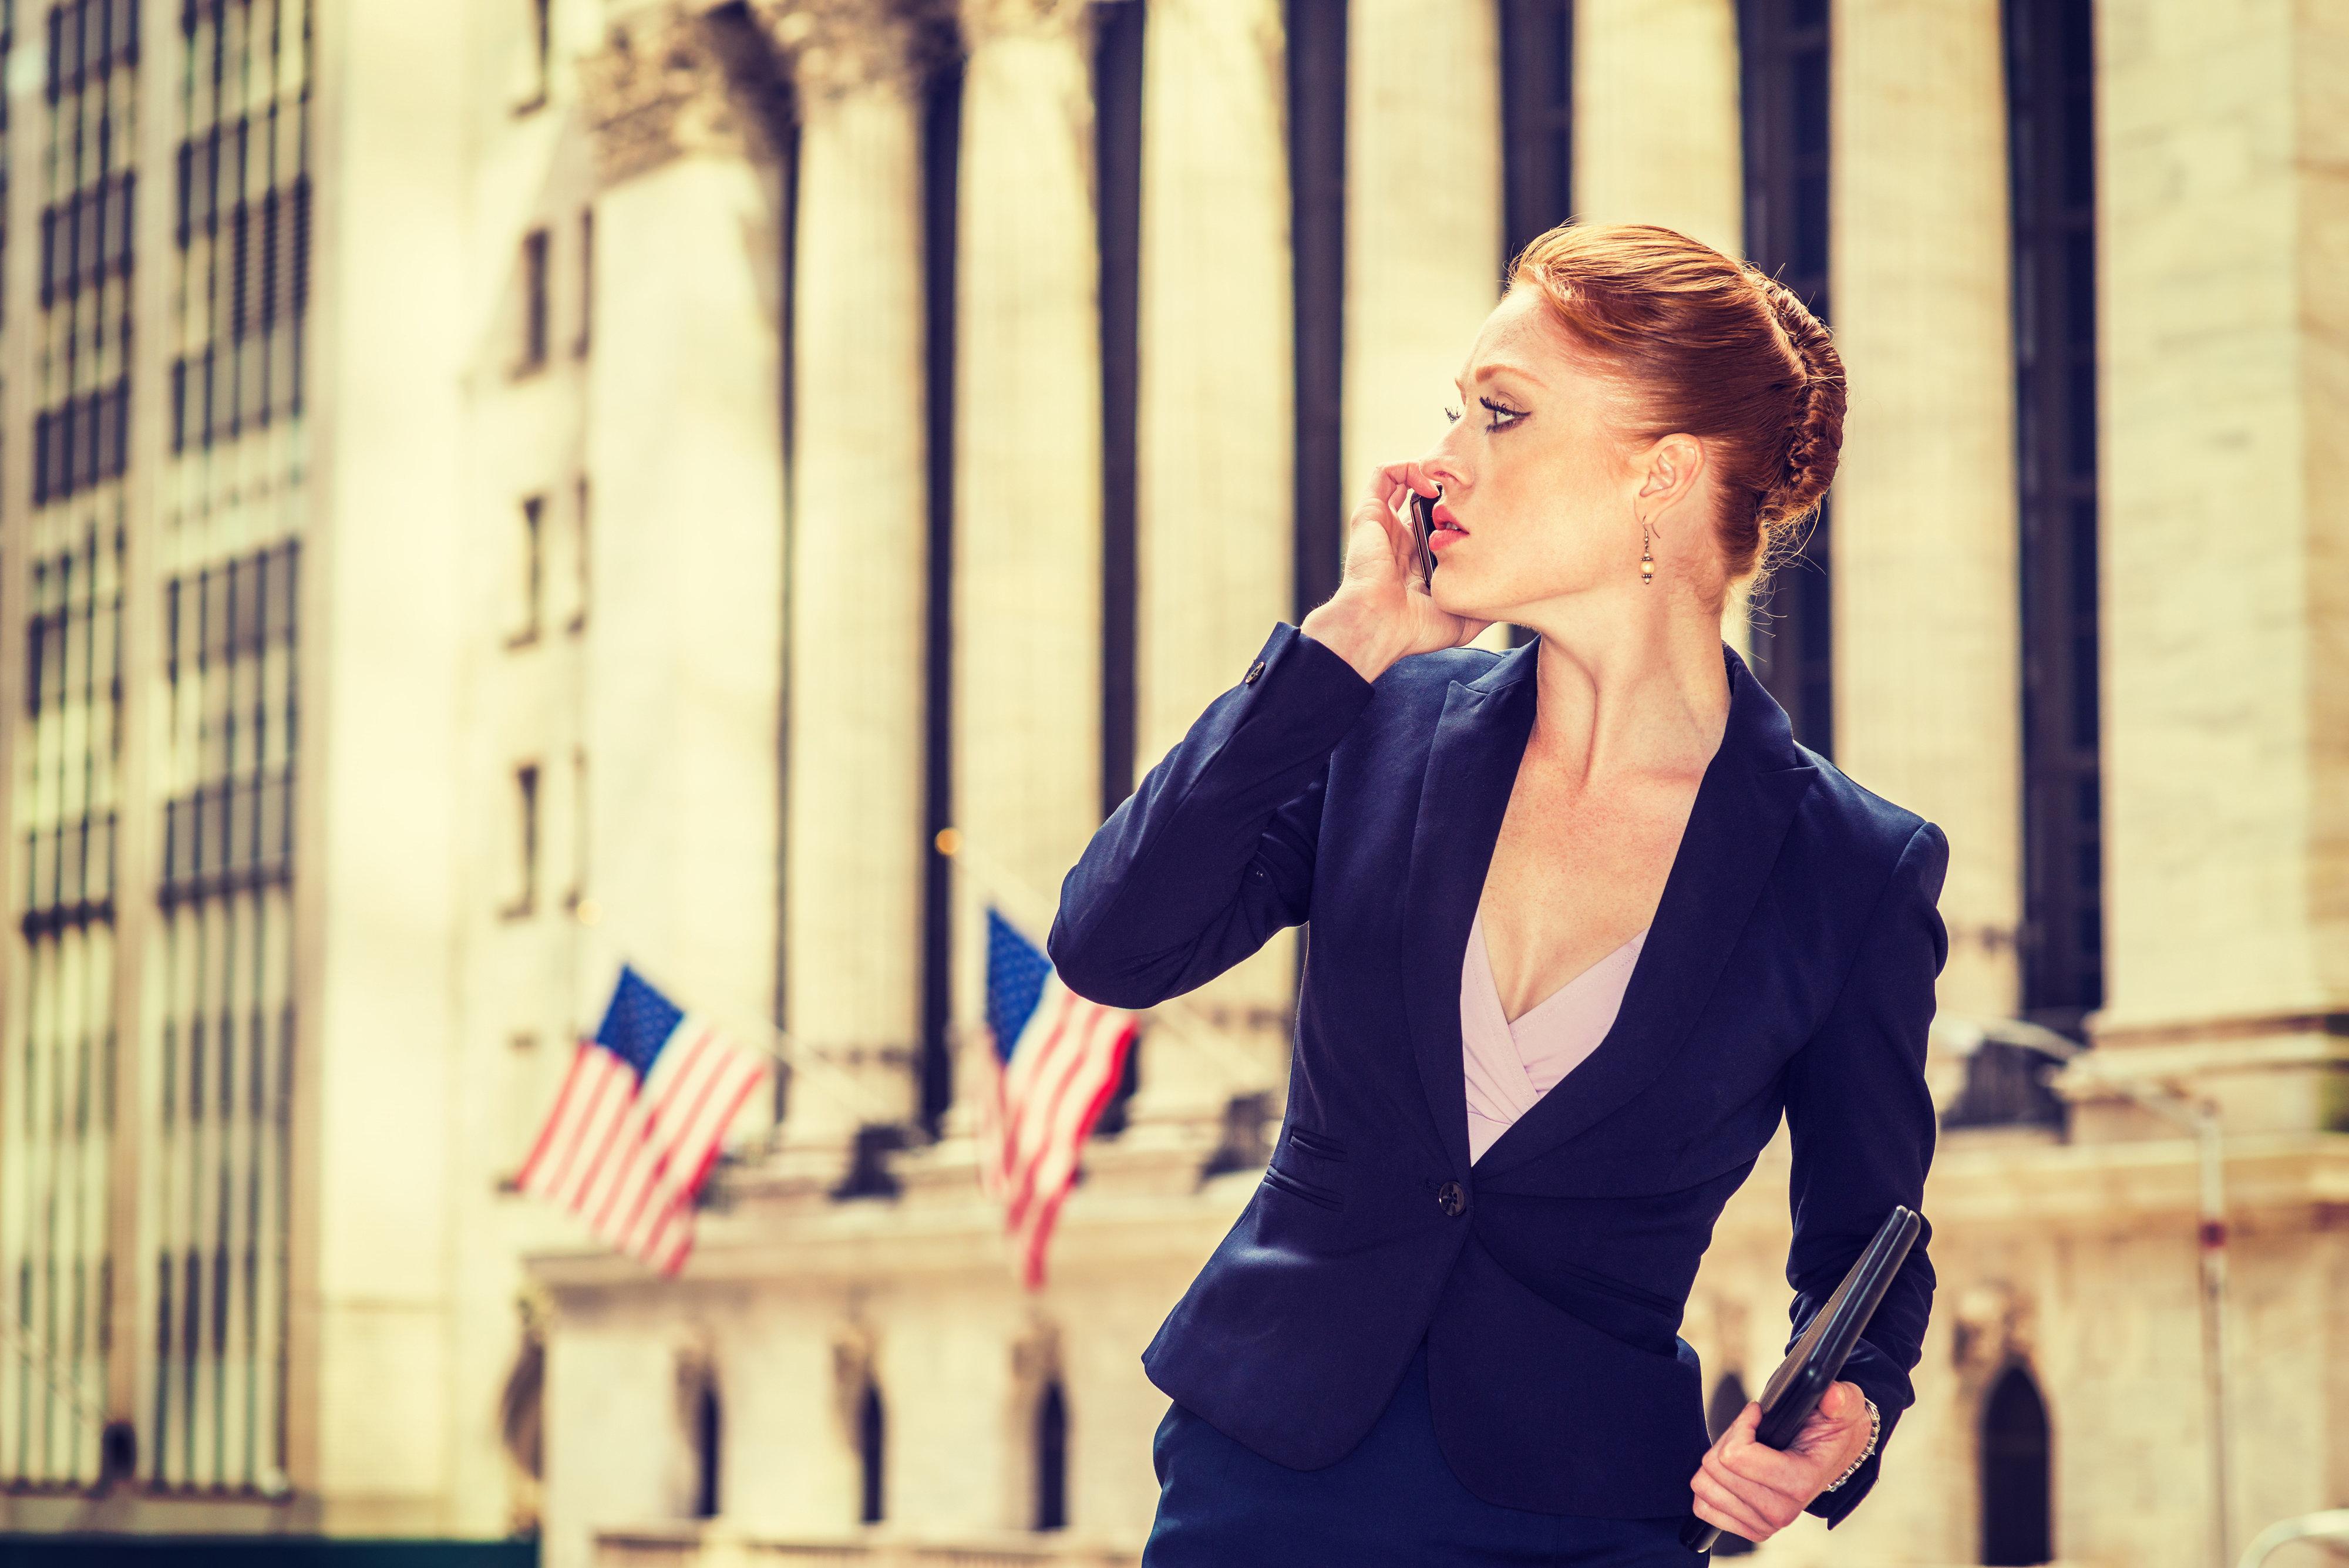 O νέος κανόνας της Wall Street στην εποχή του #Metoo: Αποφύγετε τις γυναίκες με κάθε